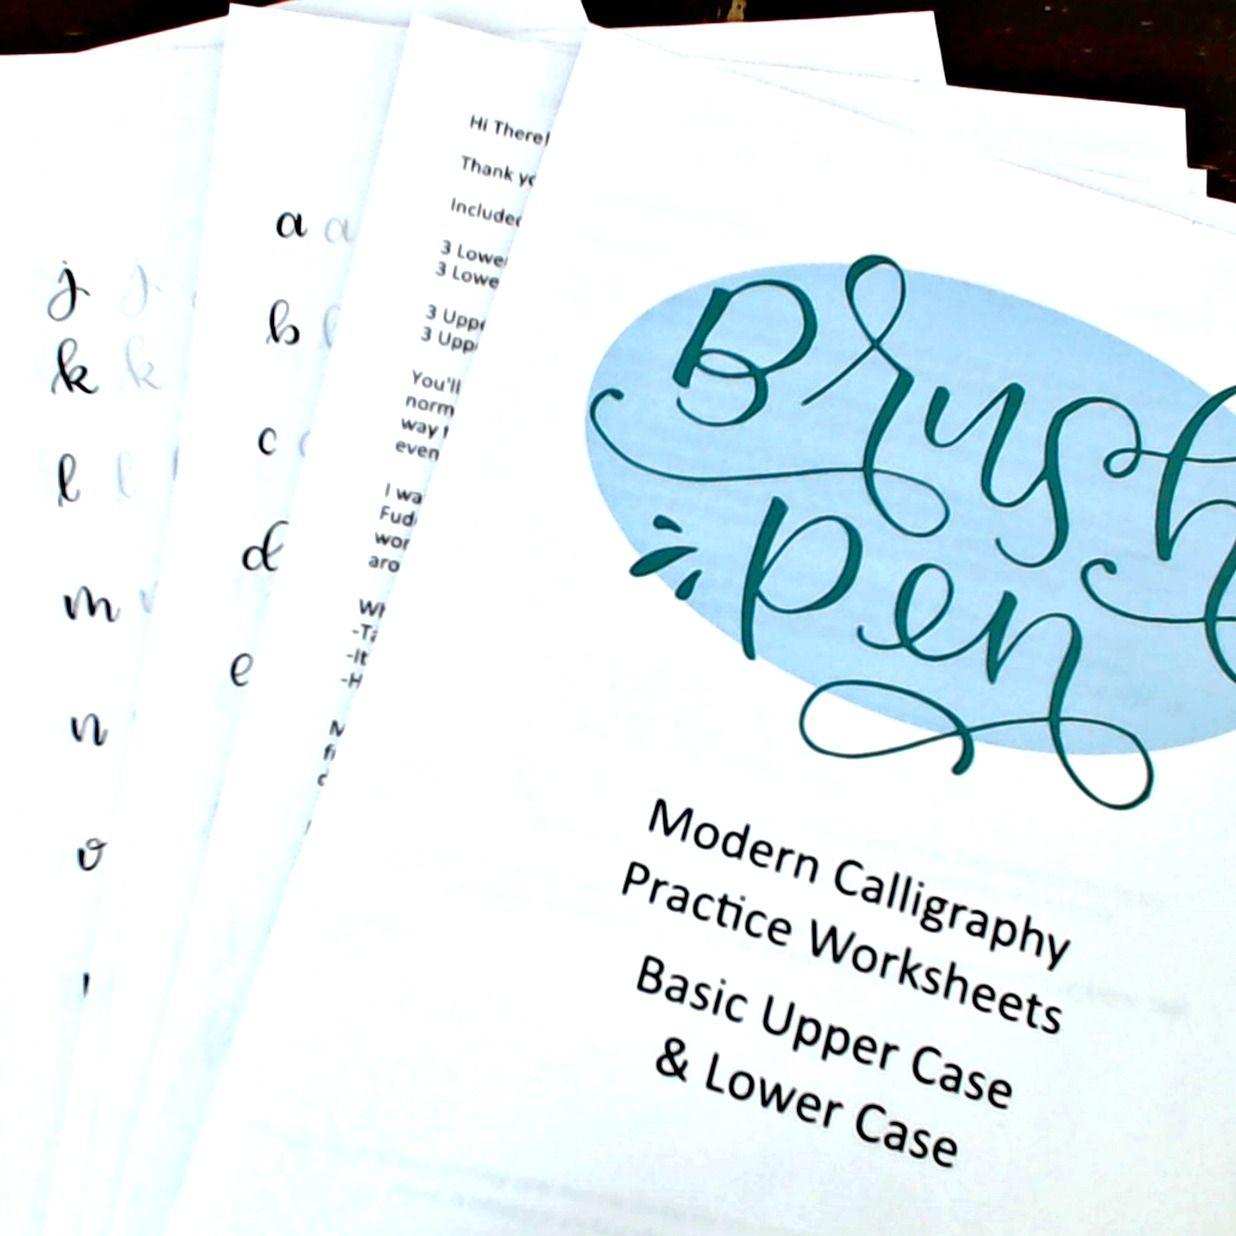 Brush Pen Modern Calligraphy Practice Worksheet Packet